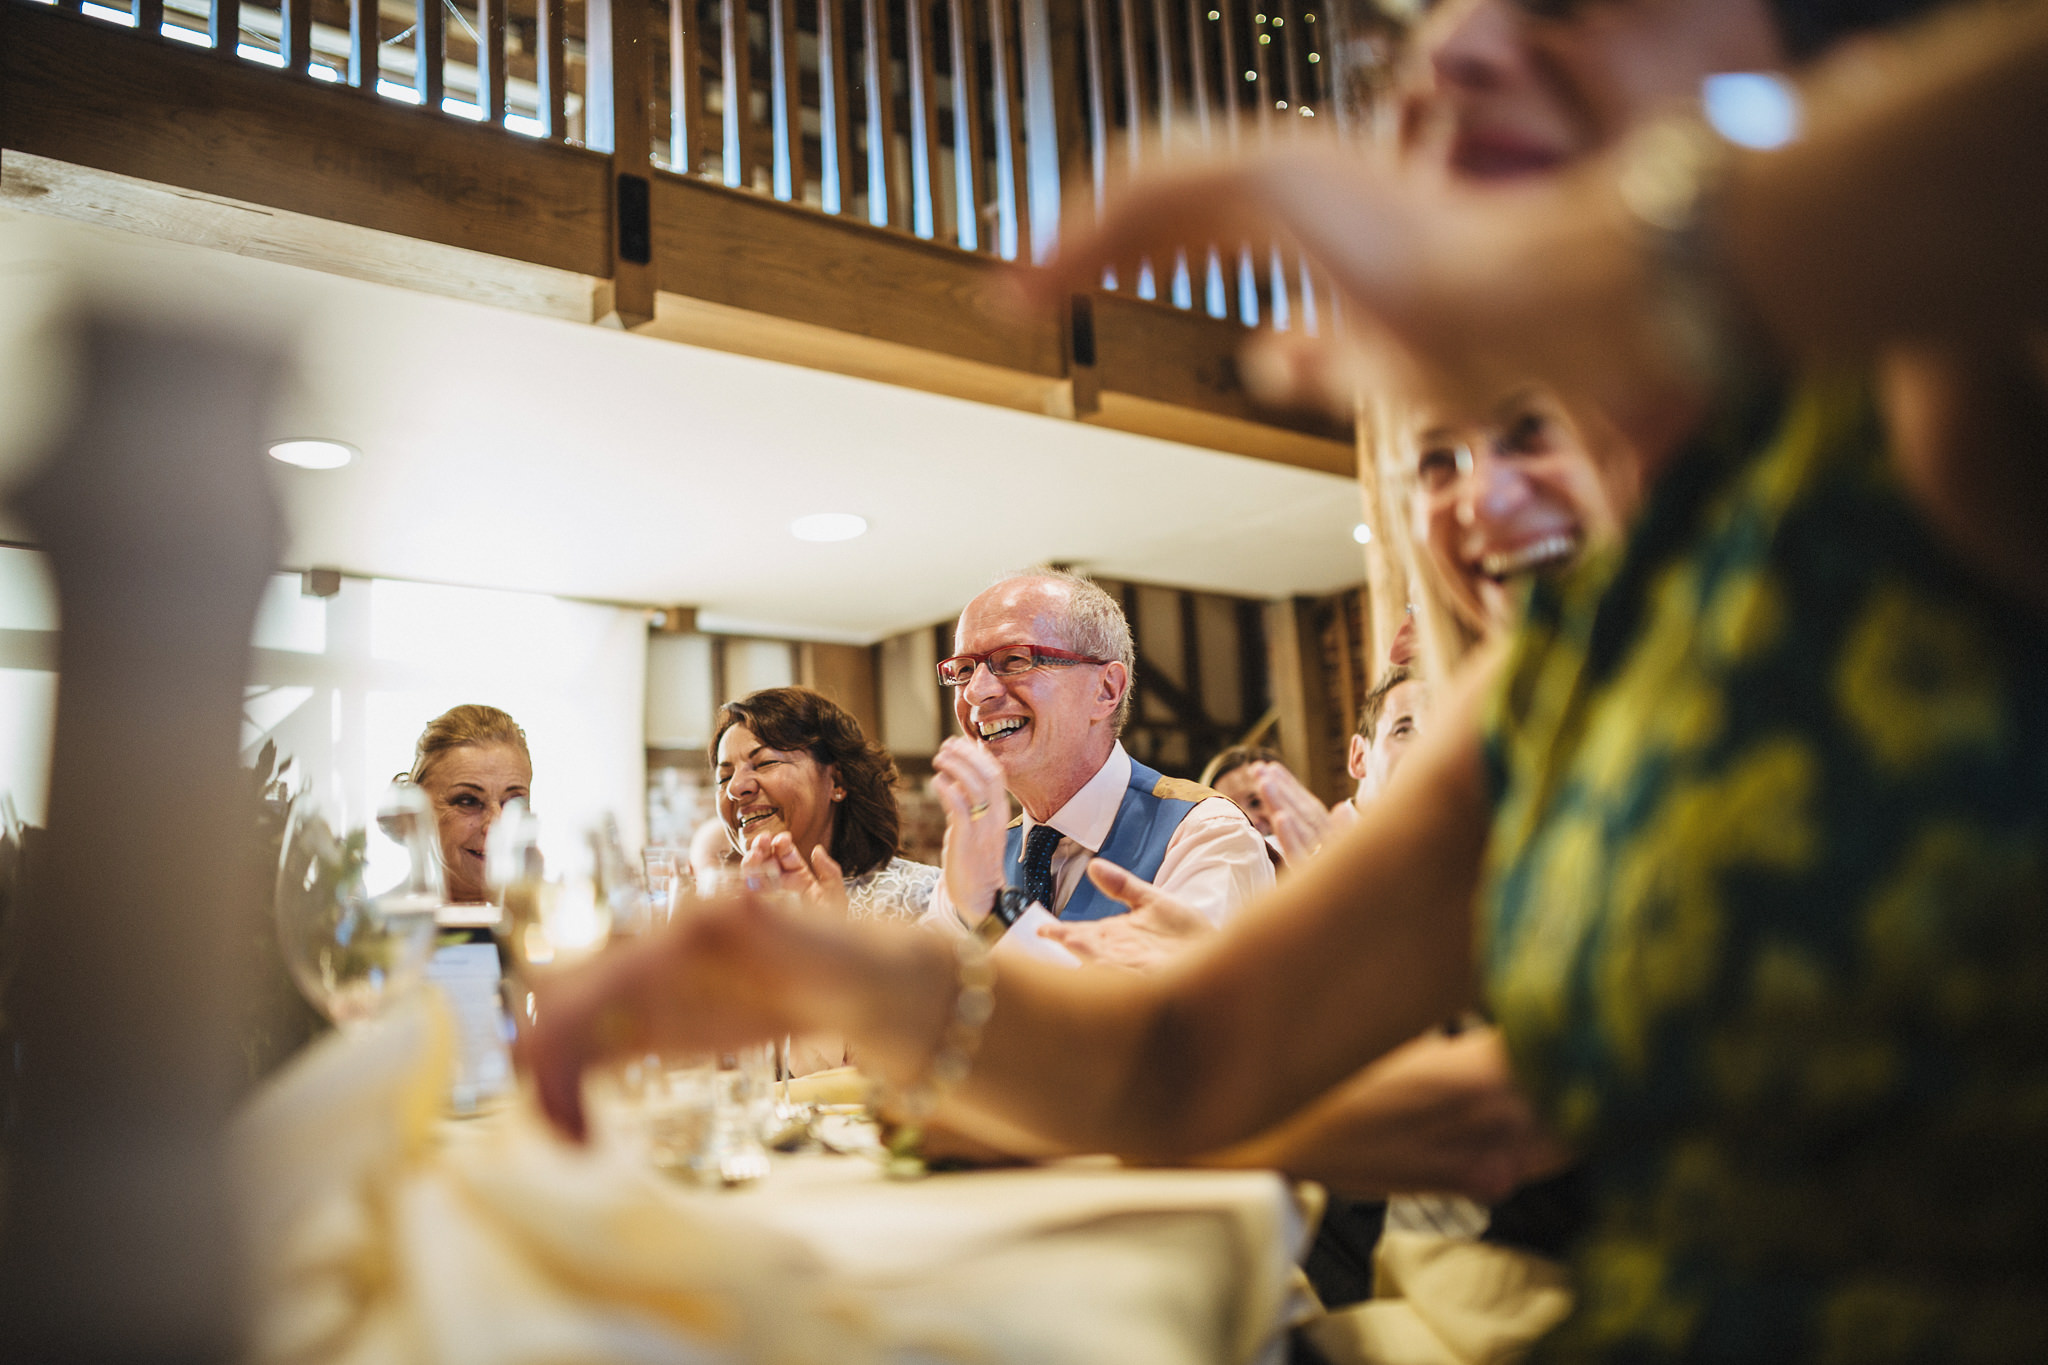 paul-marbrook-Gaynes-Park Wedding-Photographer-90110